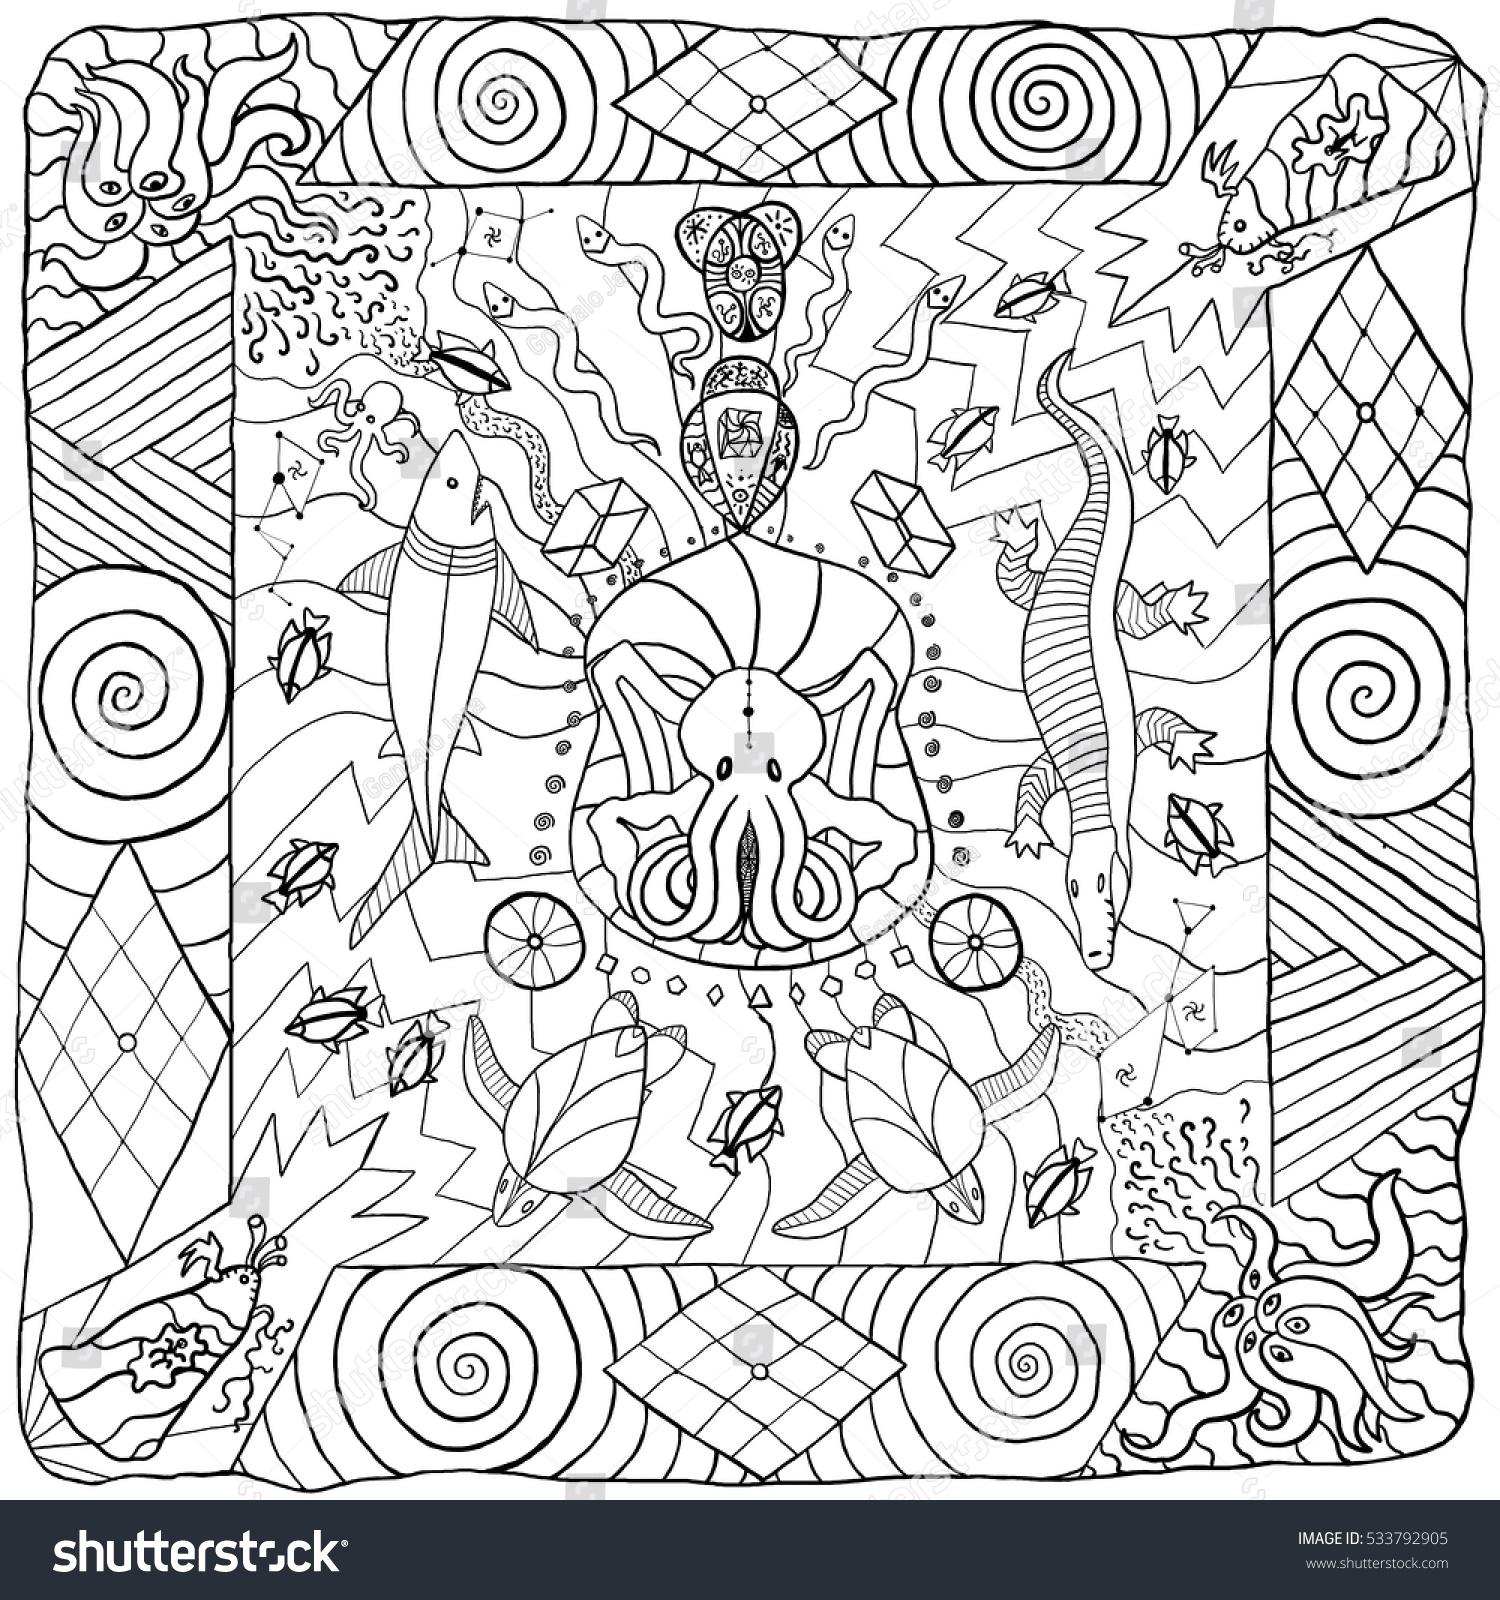 Lovecraft Cthulhu Mythos Themed Illustration Australian Stock ...